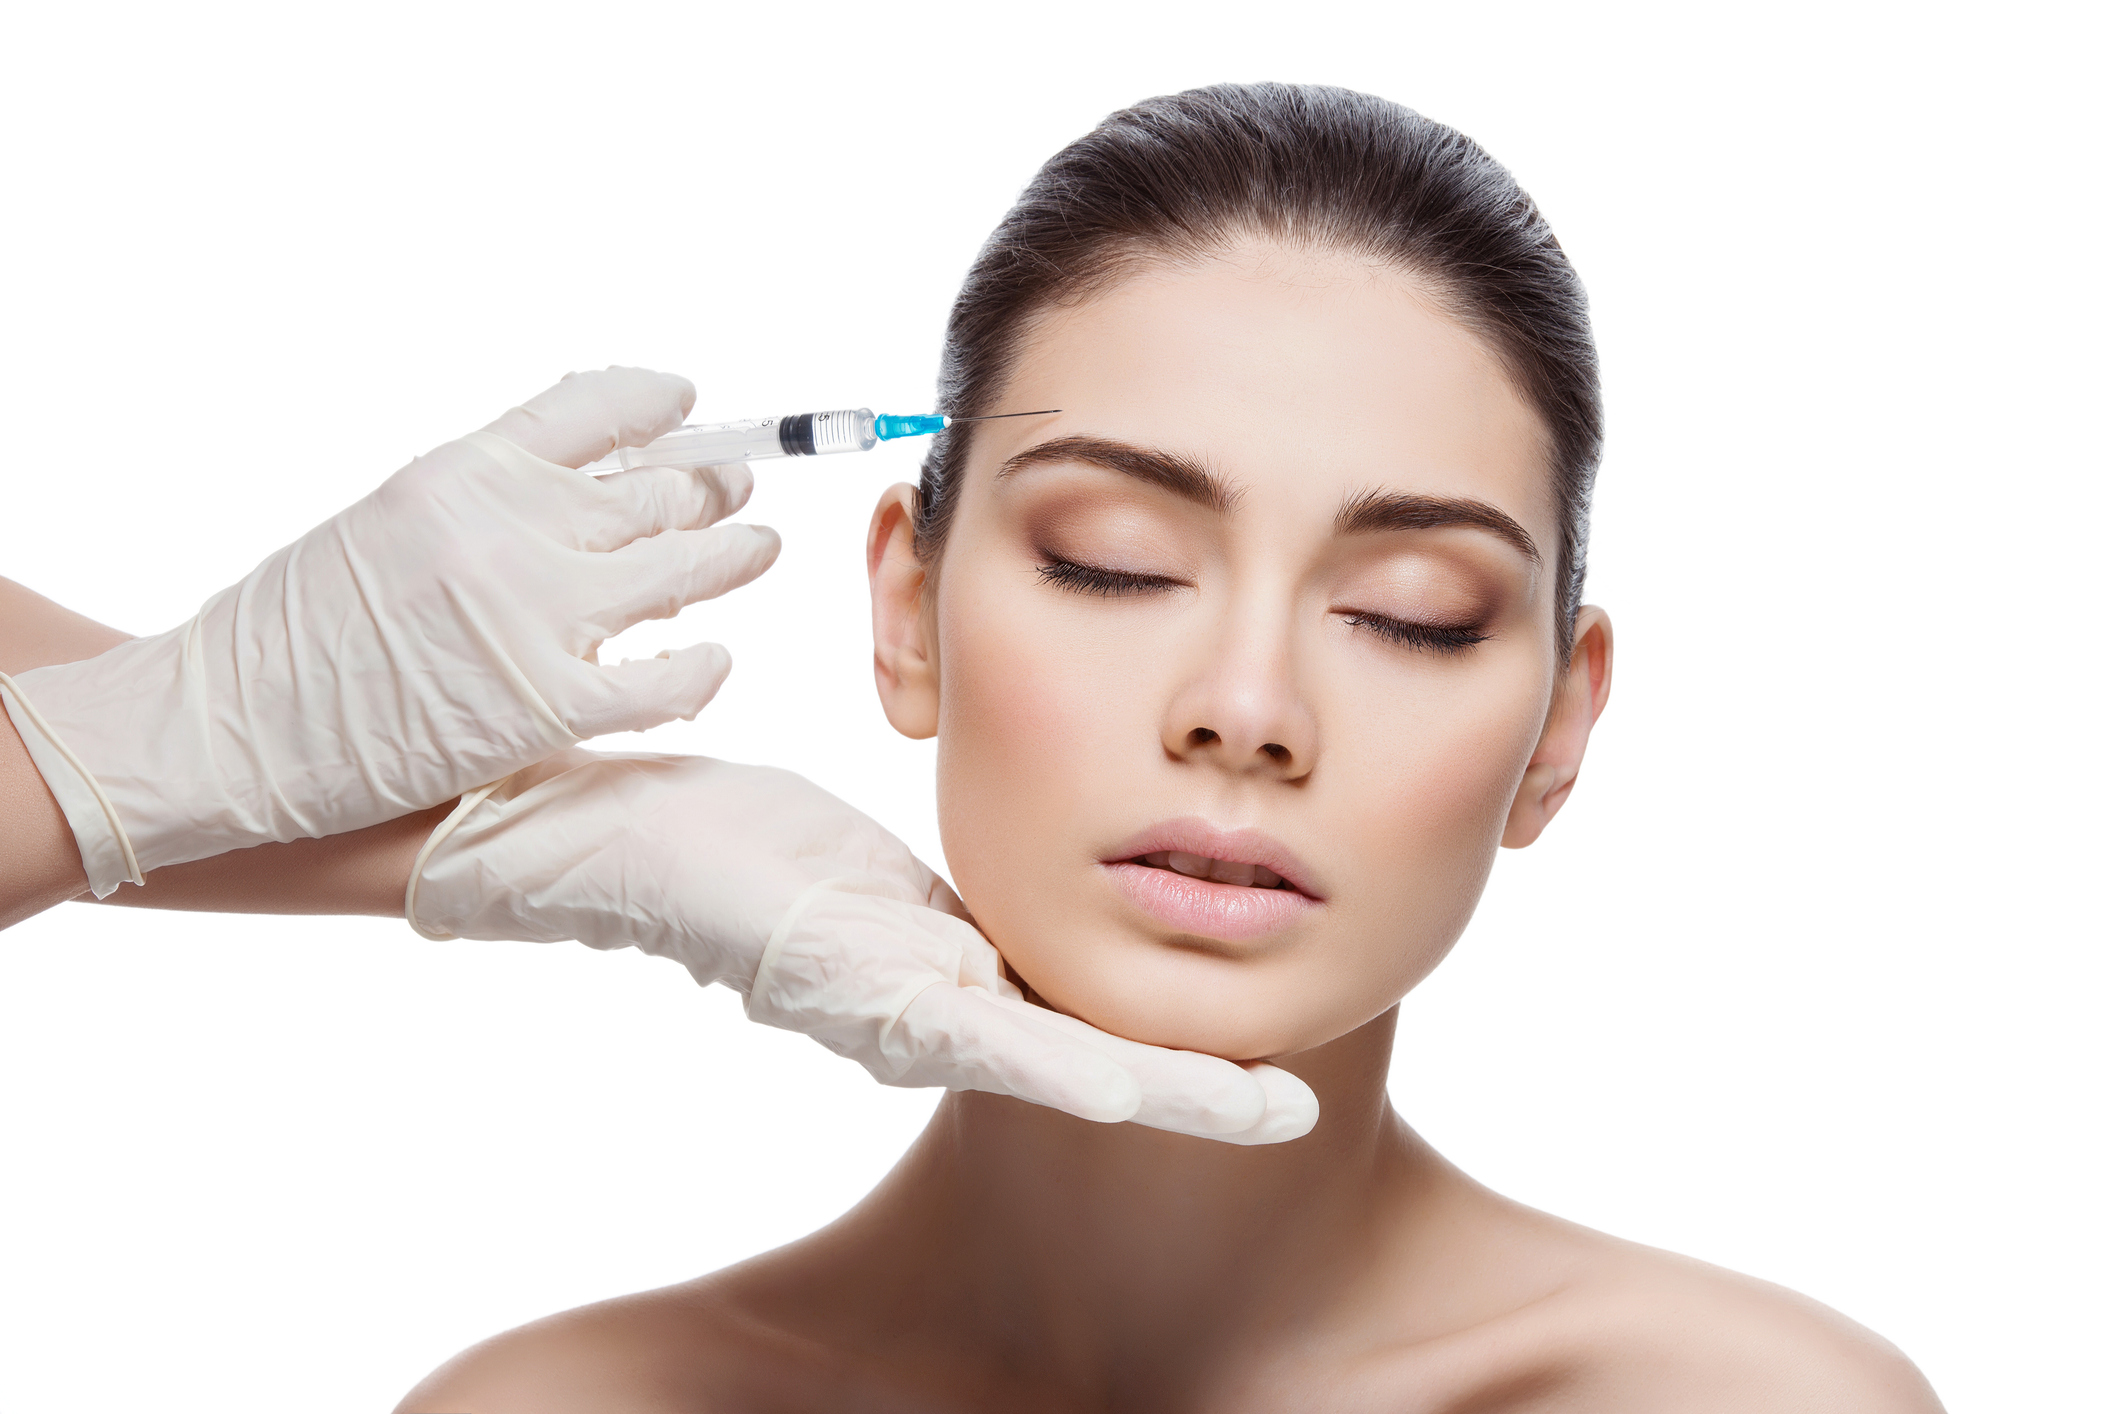 Botox/Dysport/Xeomin